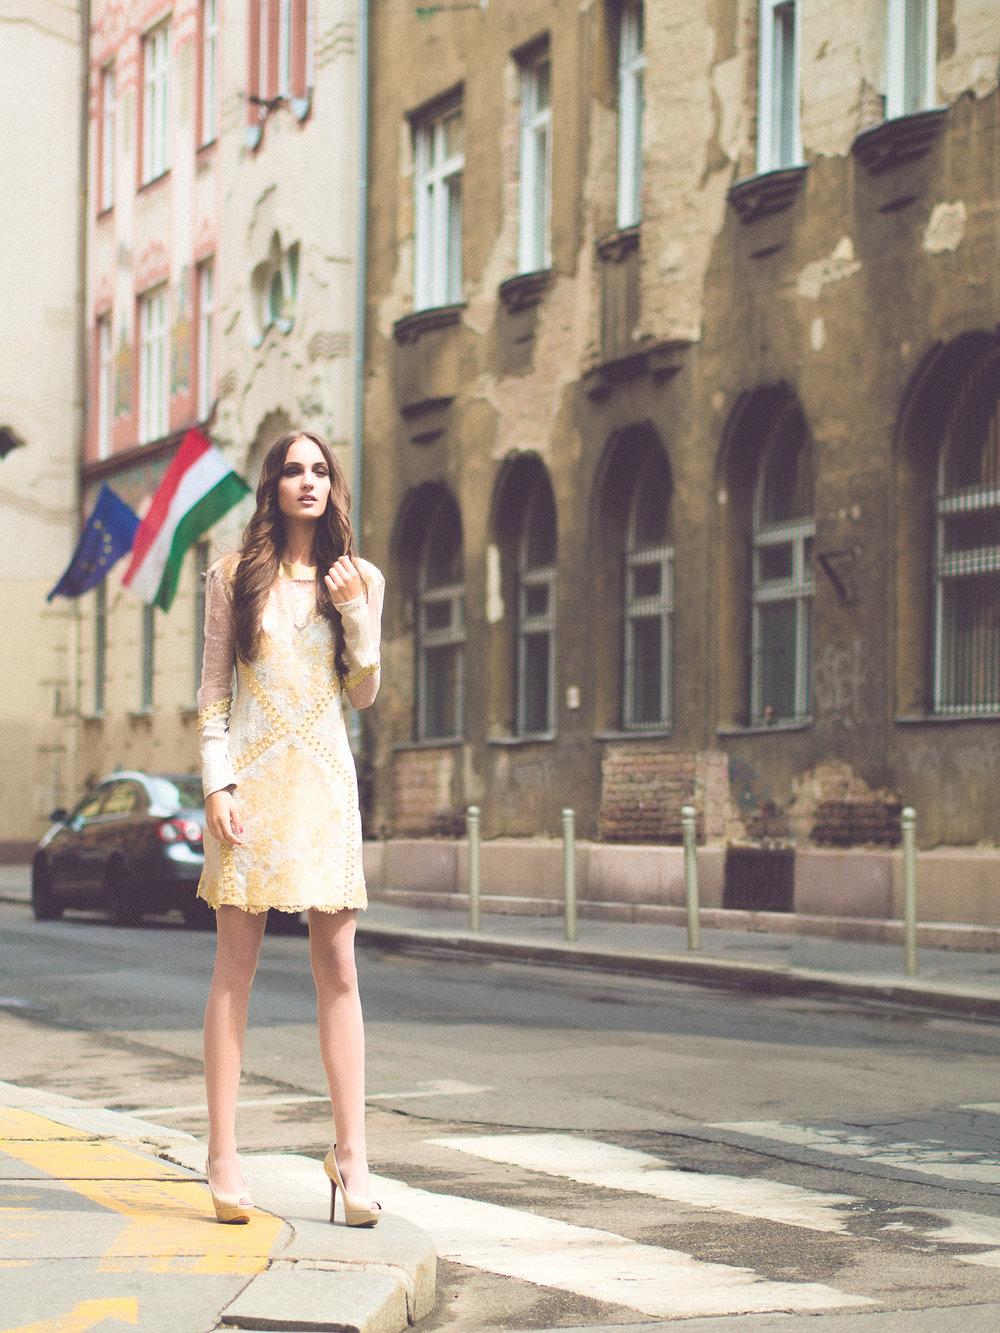 Jay McLaughlin Olympus PEN E-P5 Budapest Hungary Photoshoot Model